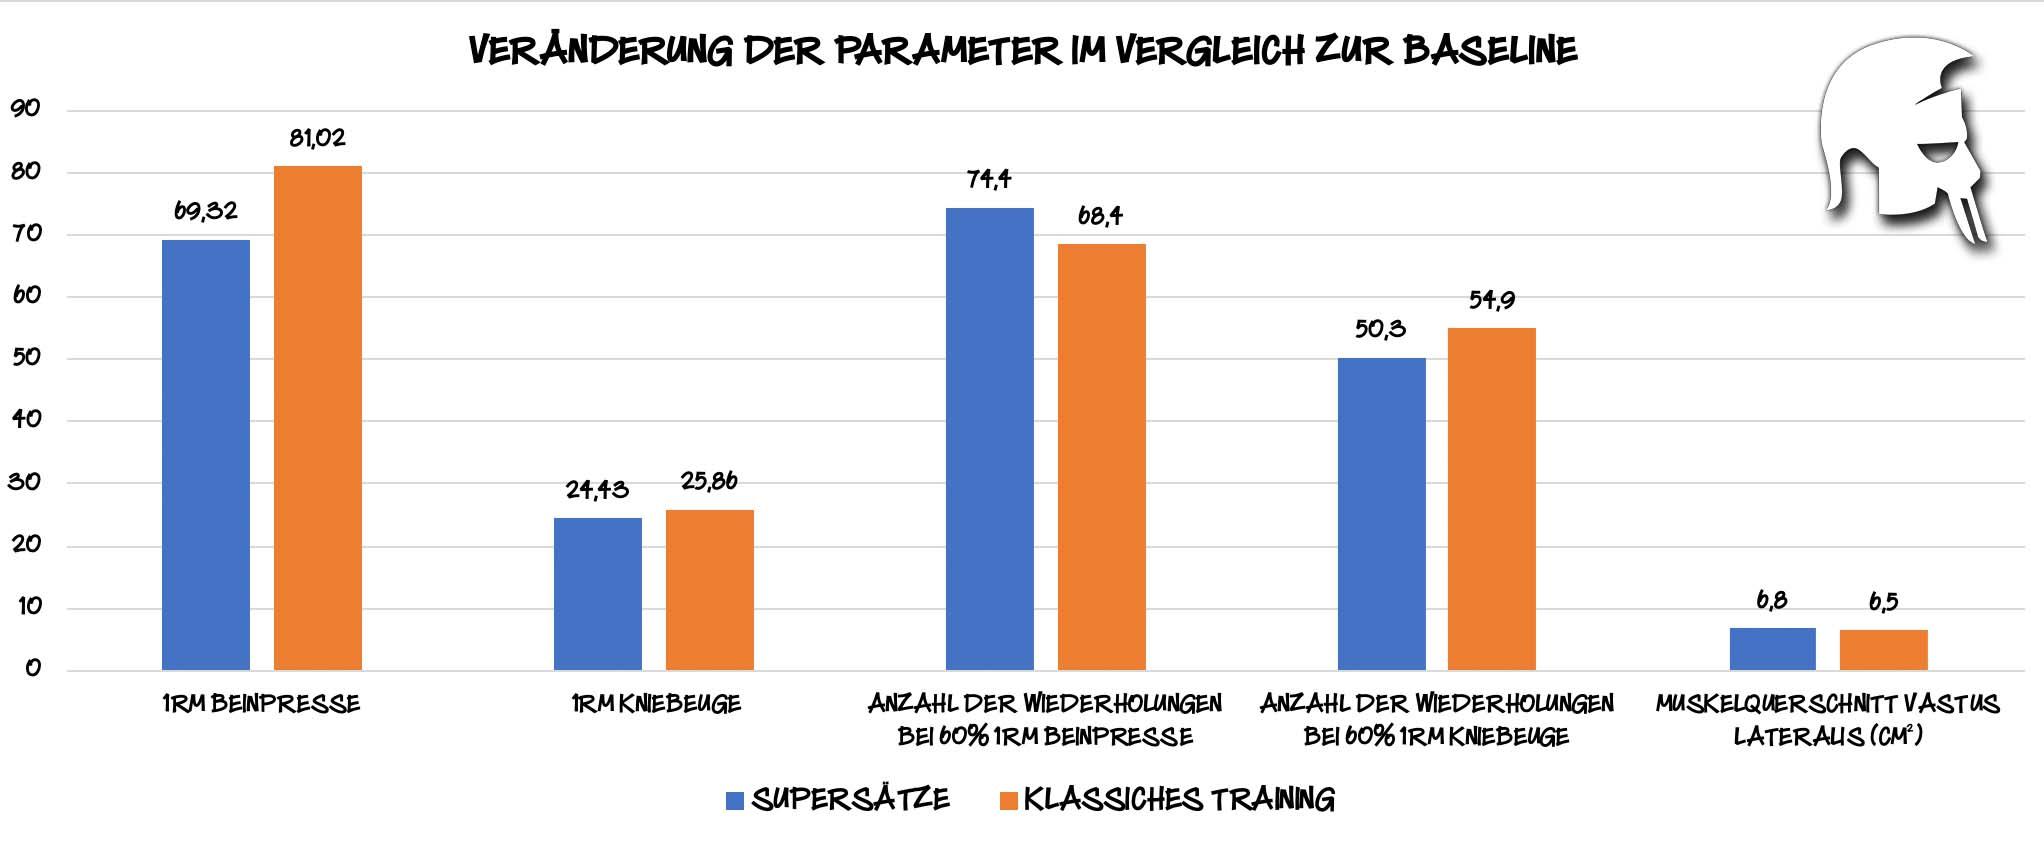 Supersätze vs. klassisches Training